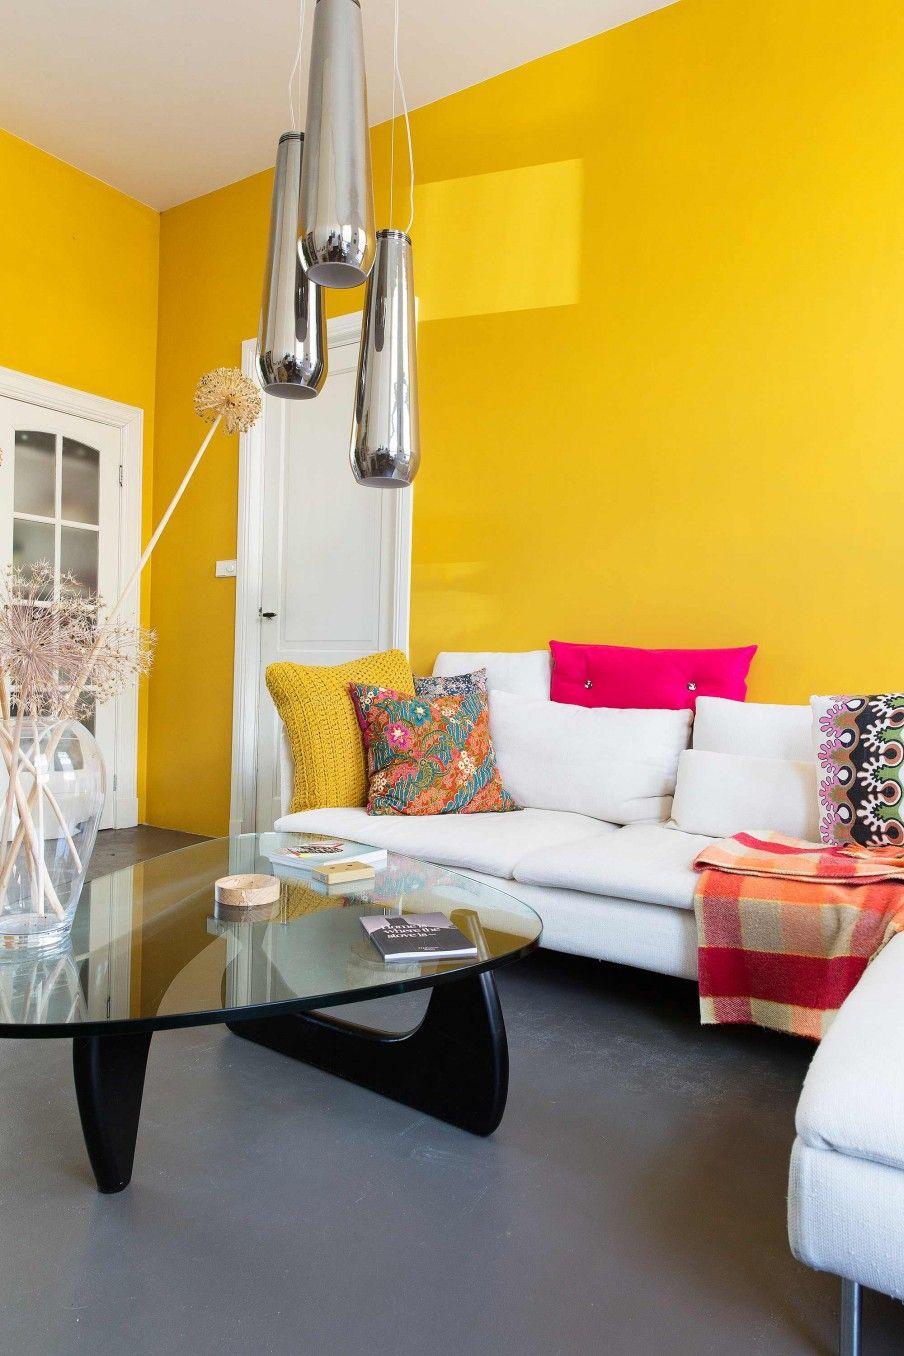 gele wand woonkamer   yellow wall livingroom   vtwonen 11-2016 ...